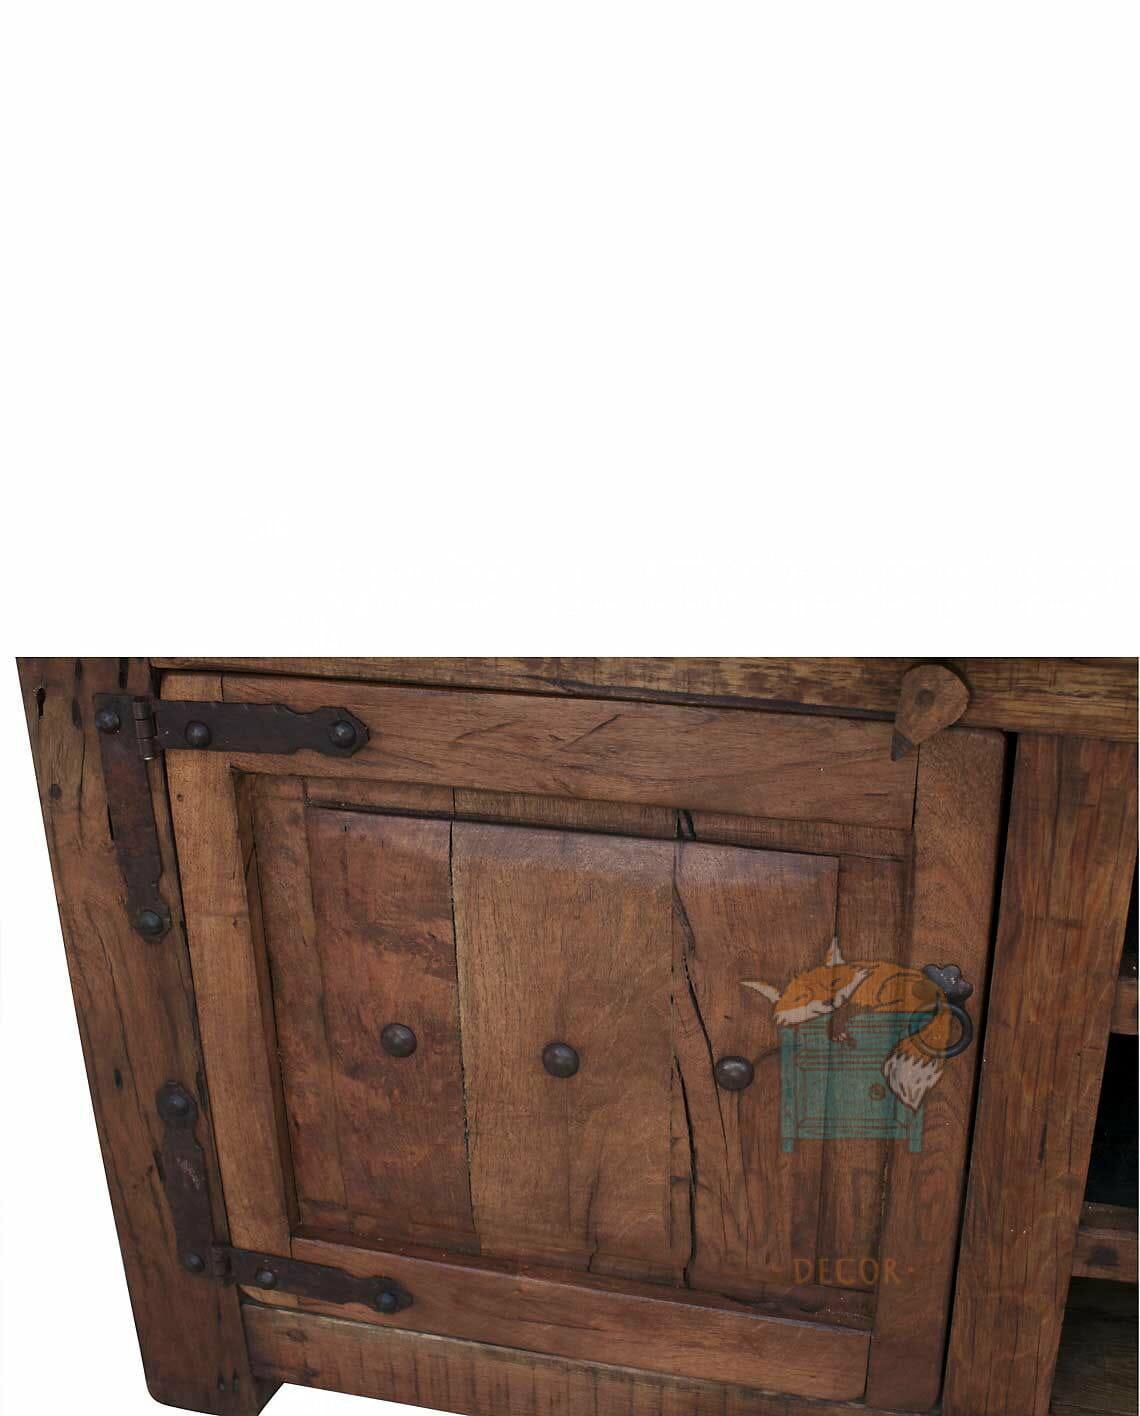 Buy alton double sink vanity online mesquite wood vanity for sale for Dresser bathroom vanity for sale